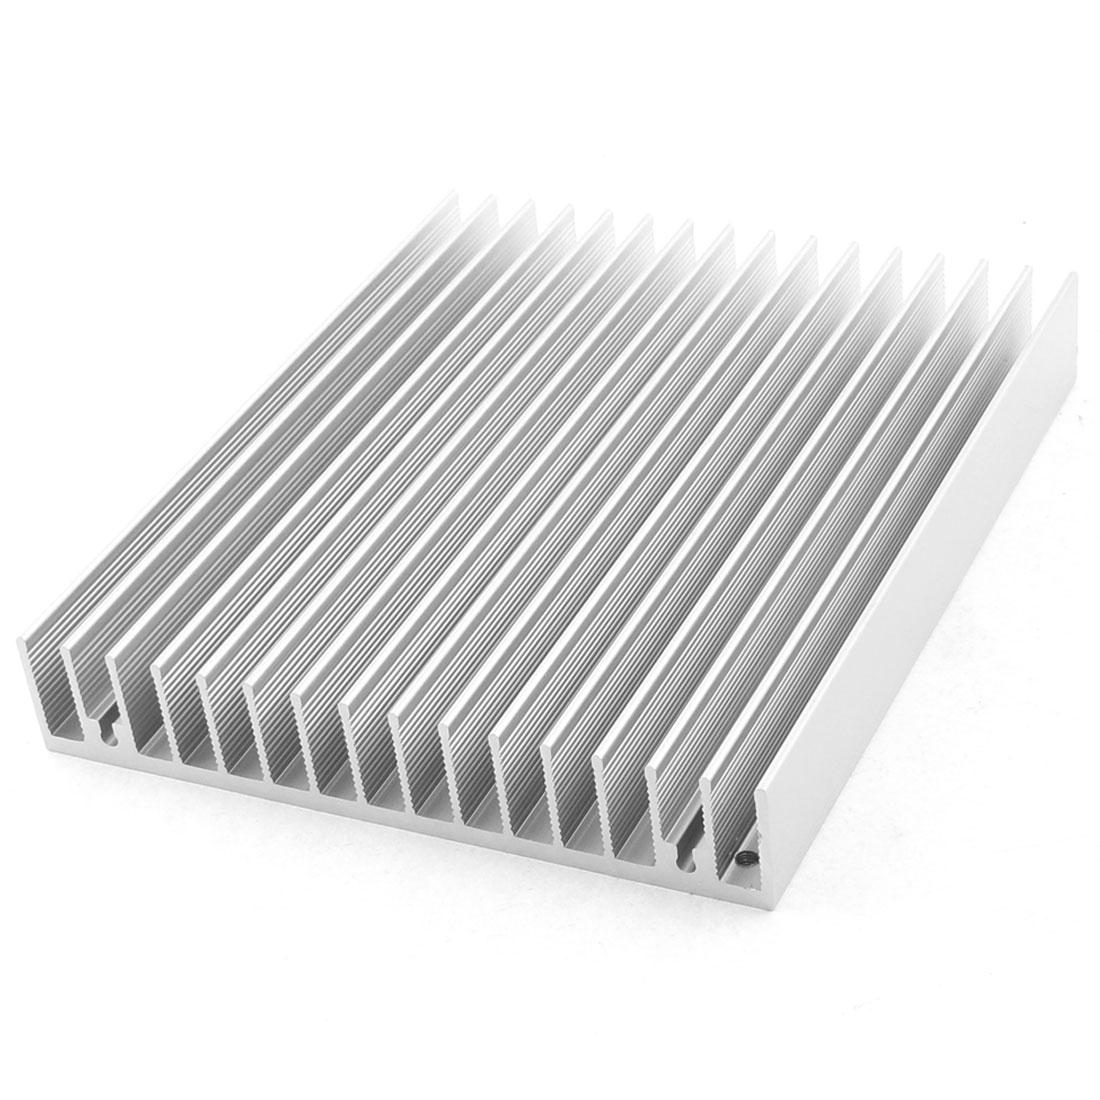 120mm x 100mm x 18mm Aluminum CPU Heat Sink Heatsink Cooling Fin Silver Tone